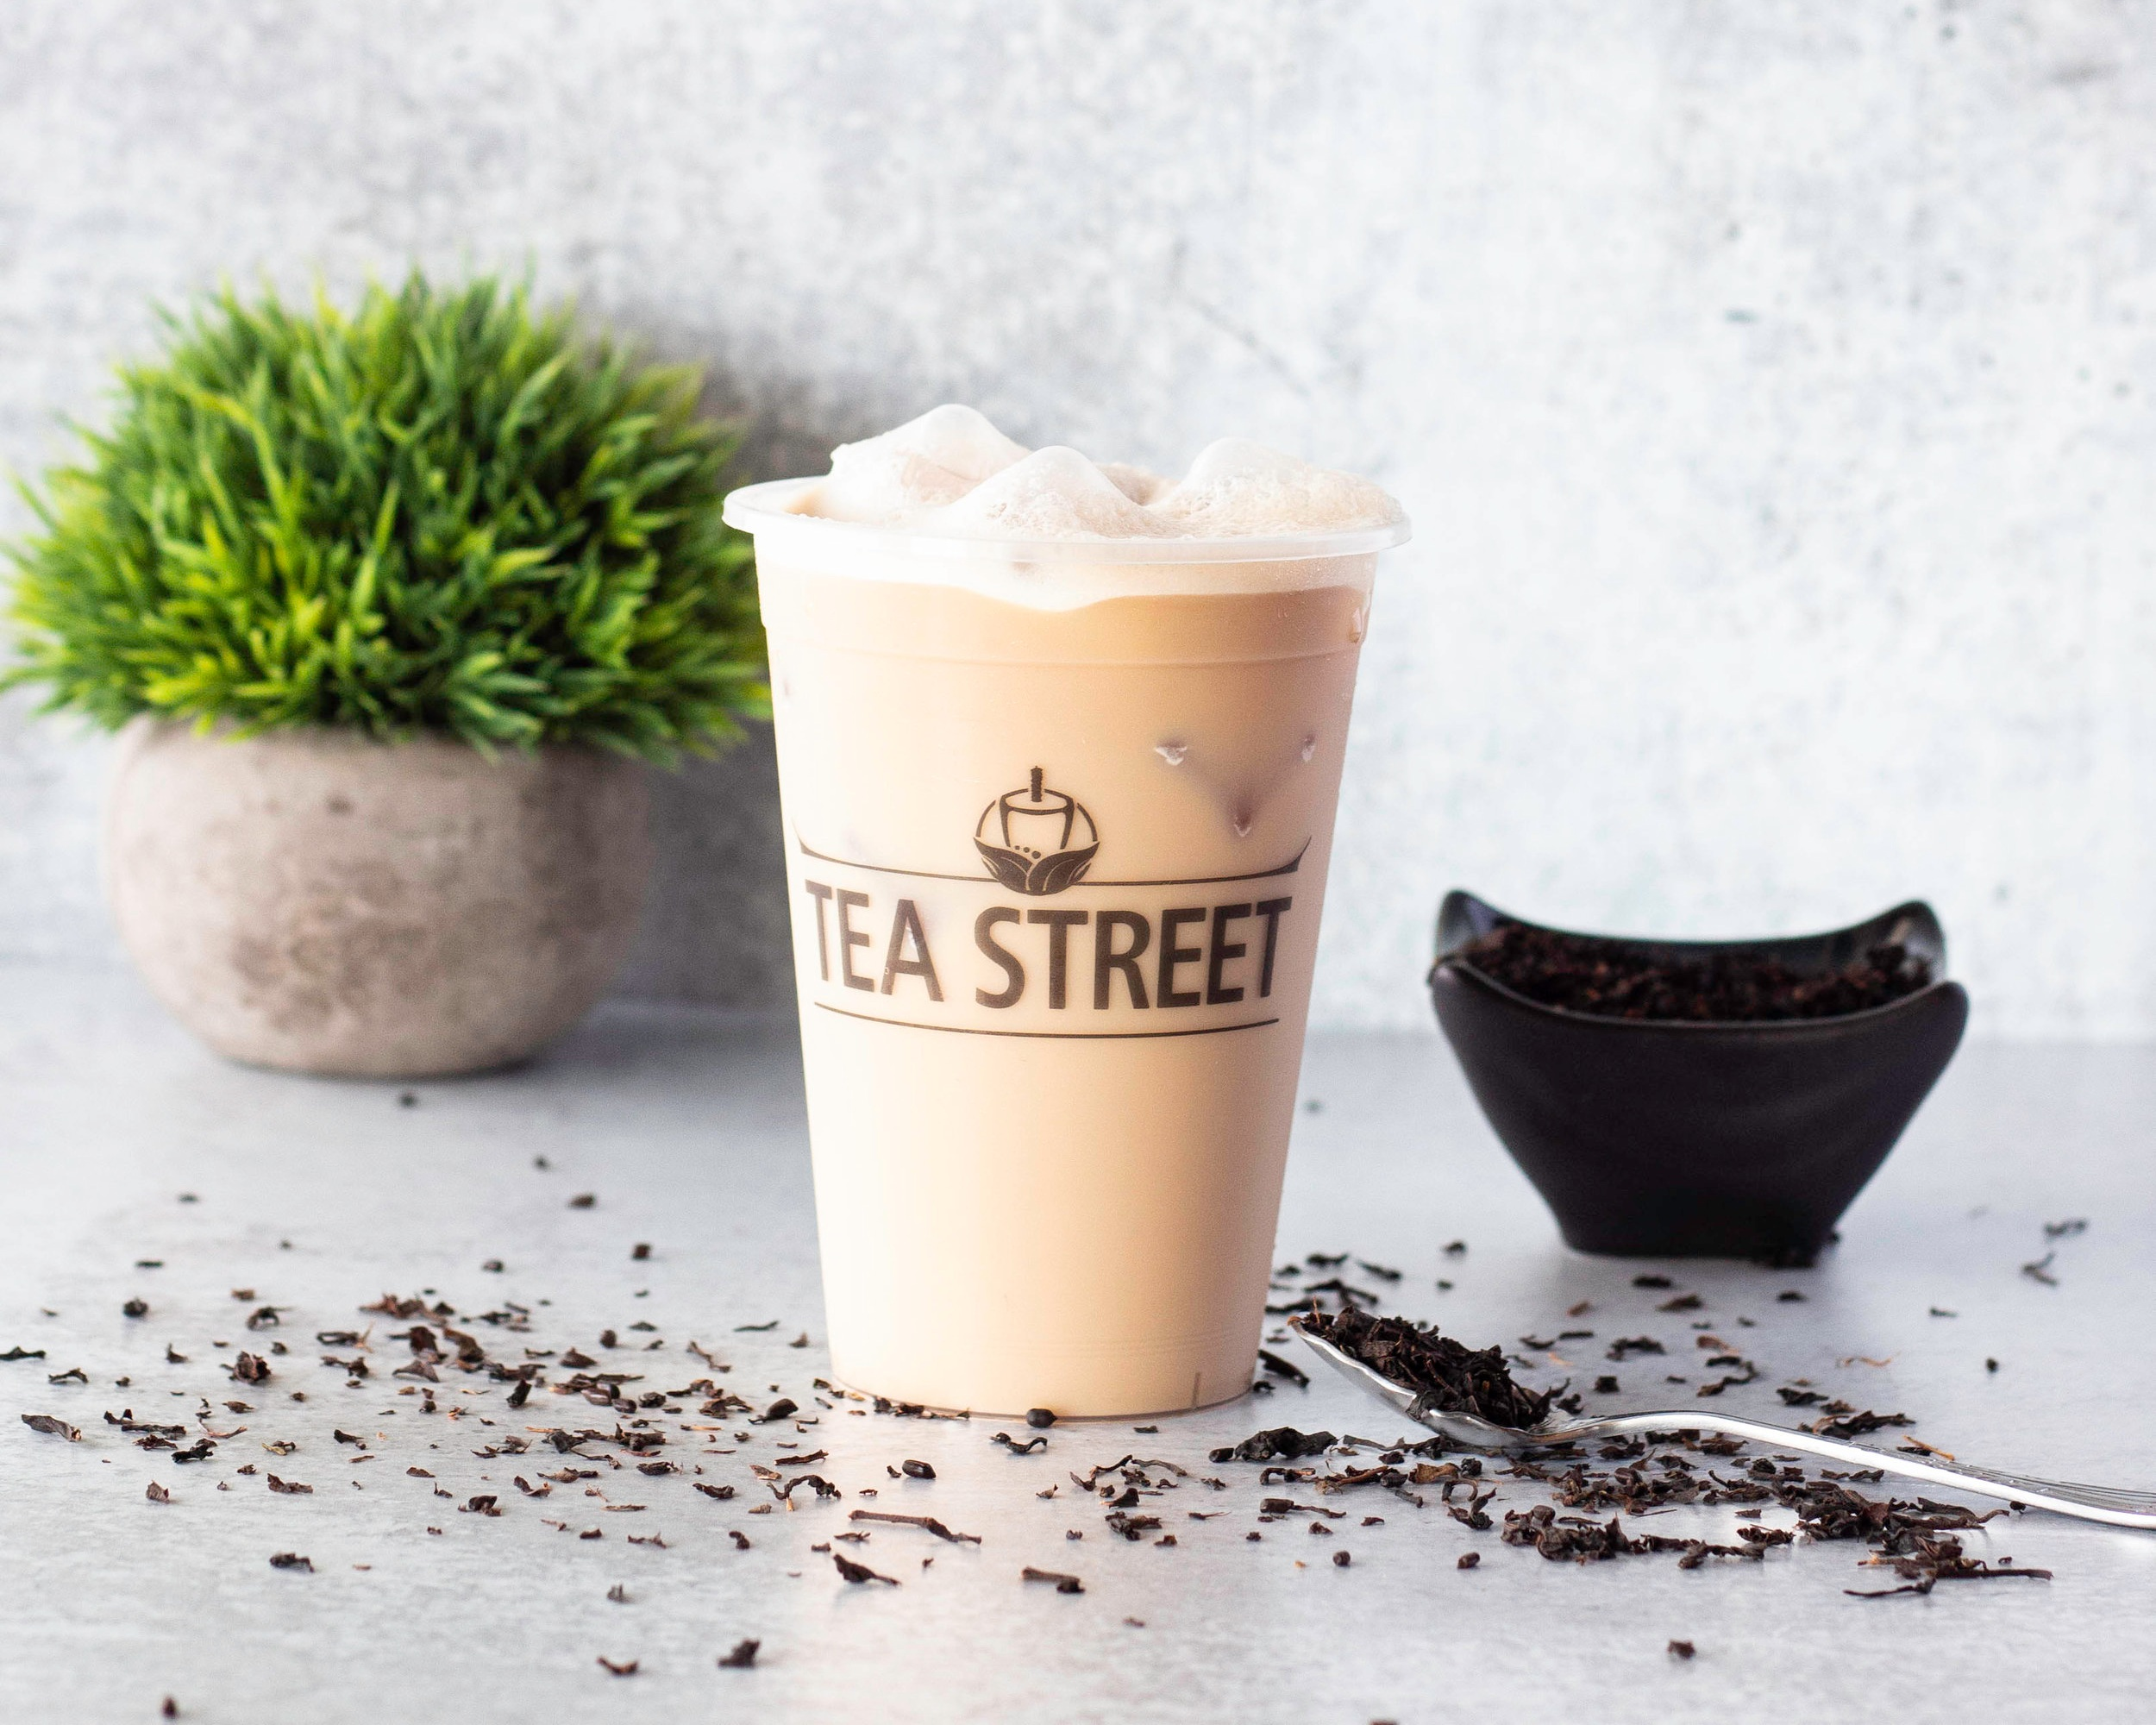 Tea Street Milk Tea